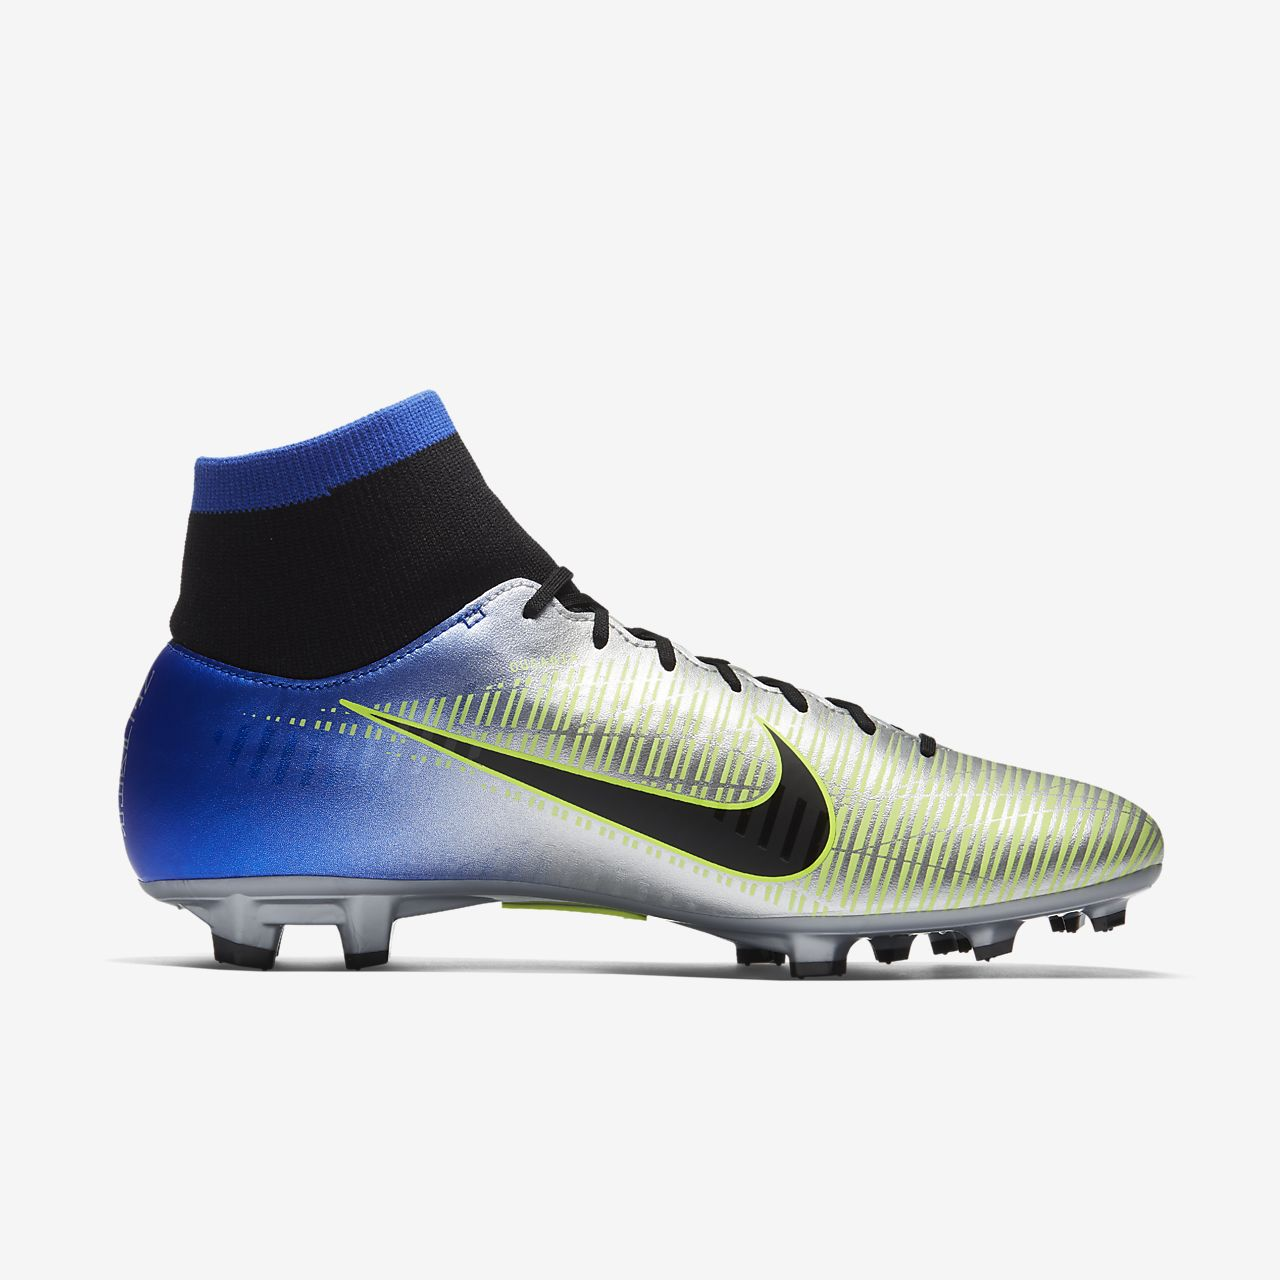 Nike Mercurial Victory Vi Dynamic Fit Neymar FG Zapatillas de Fútbol ... 9d2c0140d33dd